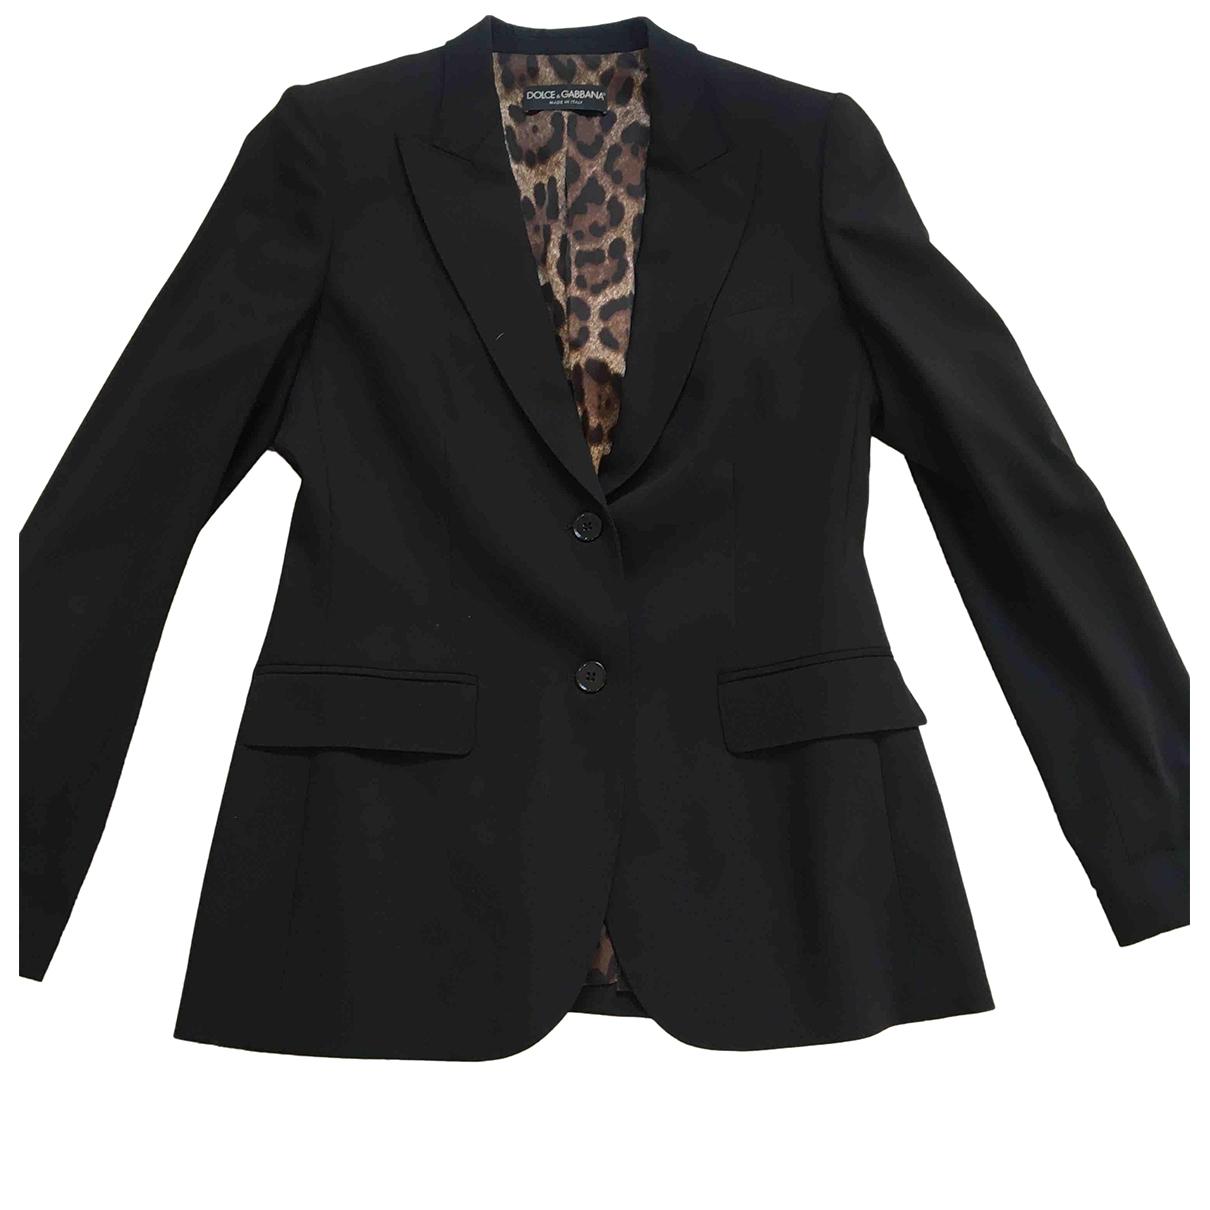 Dolce & Gabbana \N Jacke in  Schwarz Wolle